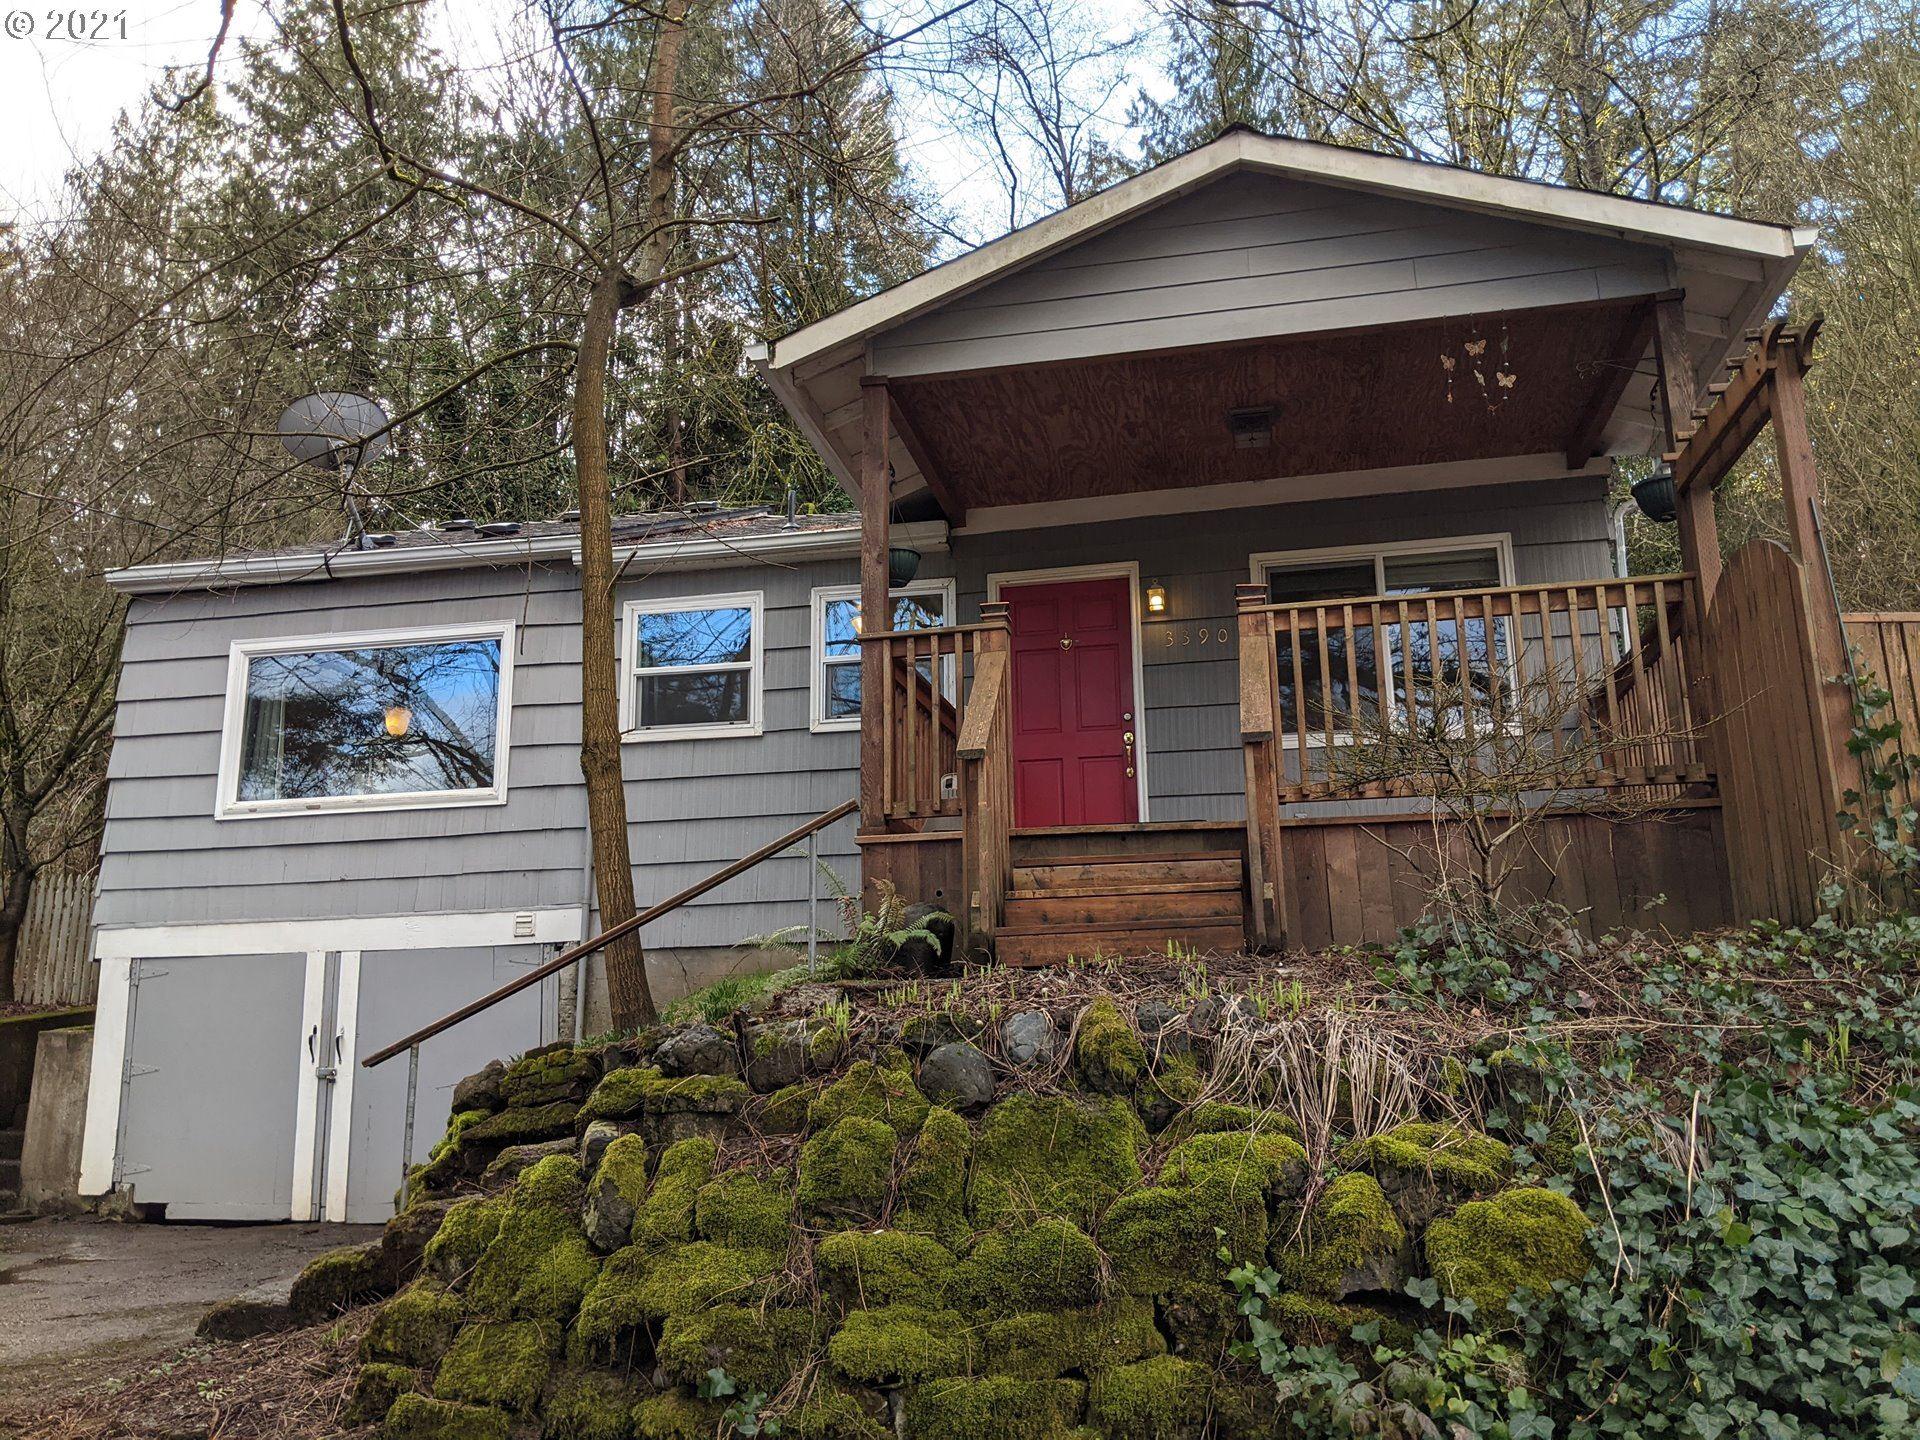 3390 SW BEAVERTON HILLSDALE HWY, Portland, OR 97239 - MLS#: 21064049